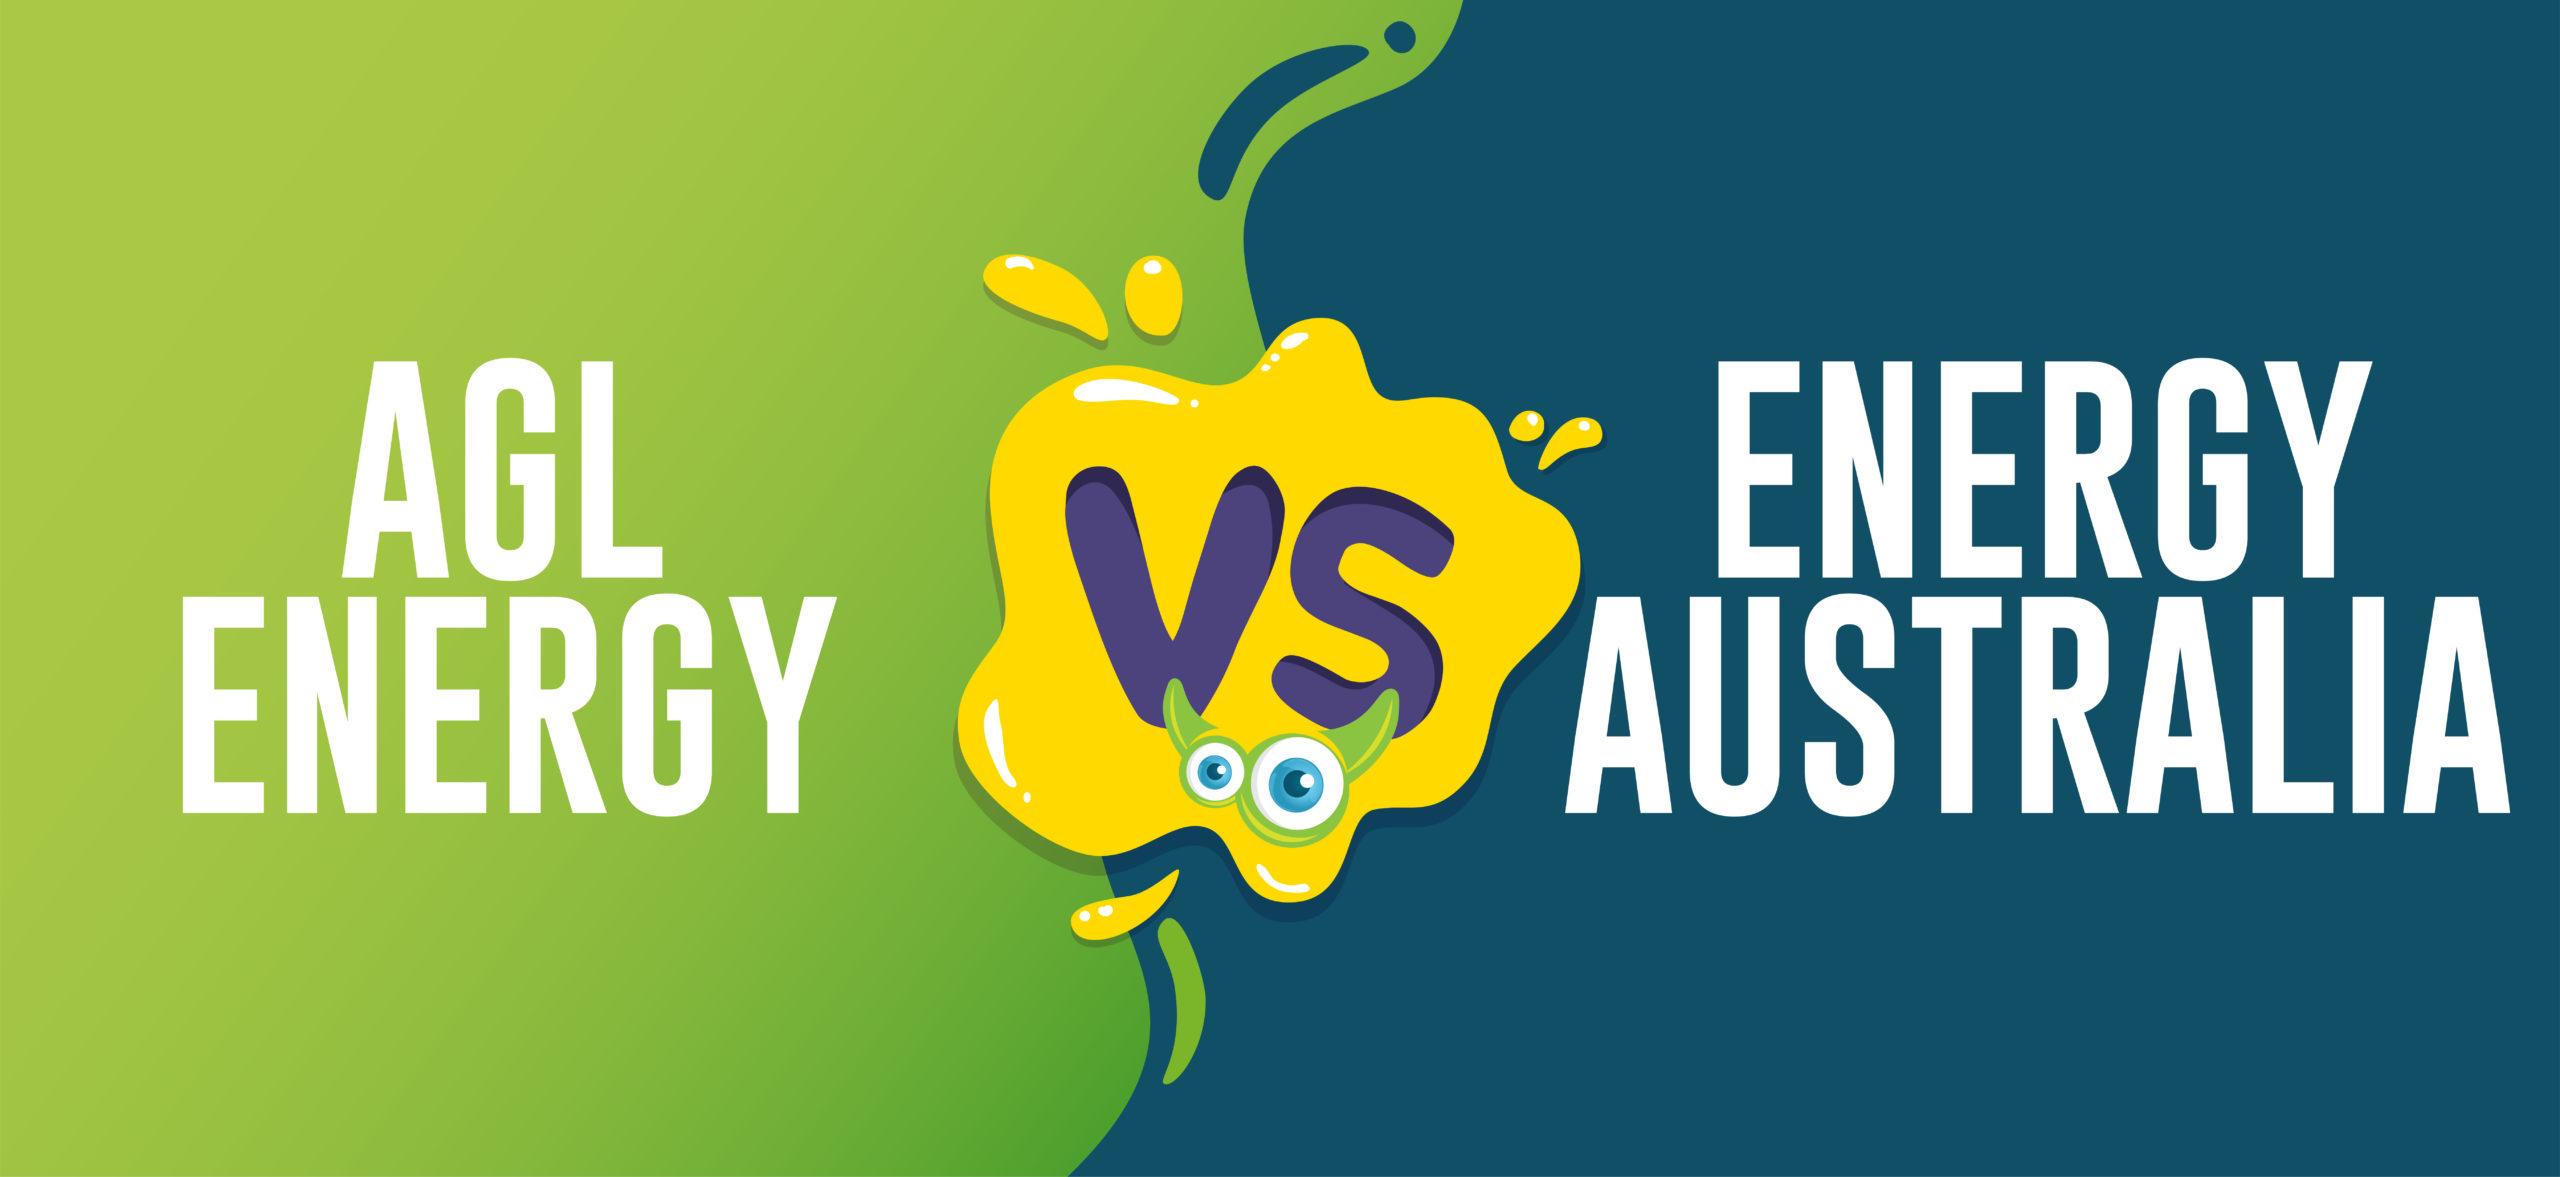 AGL vs Energy Australia, who wins?